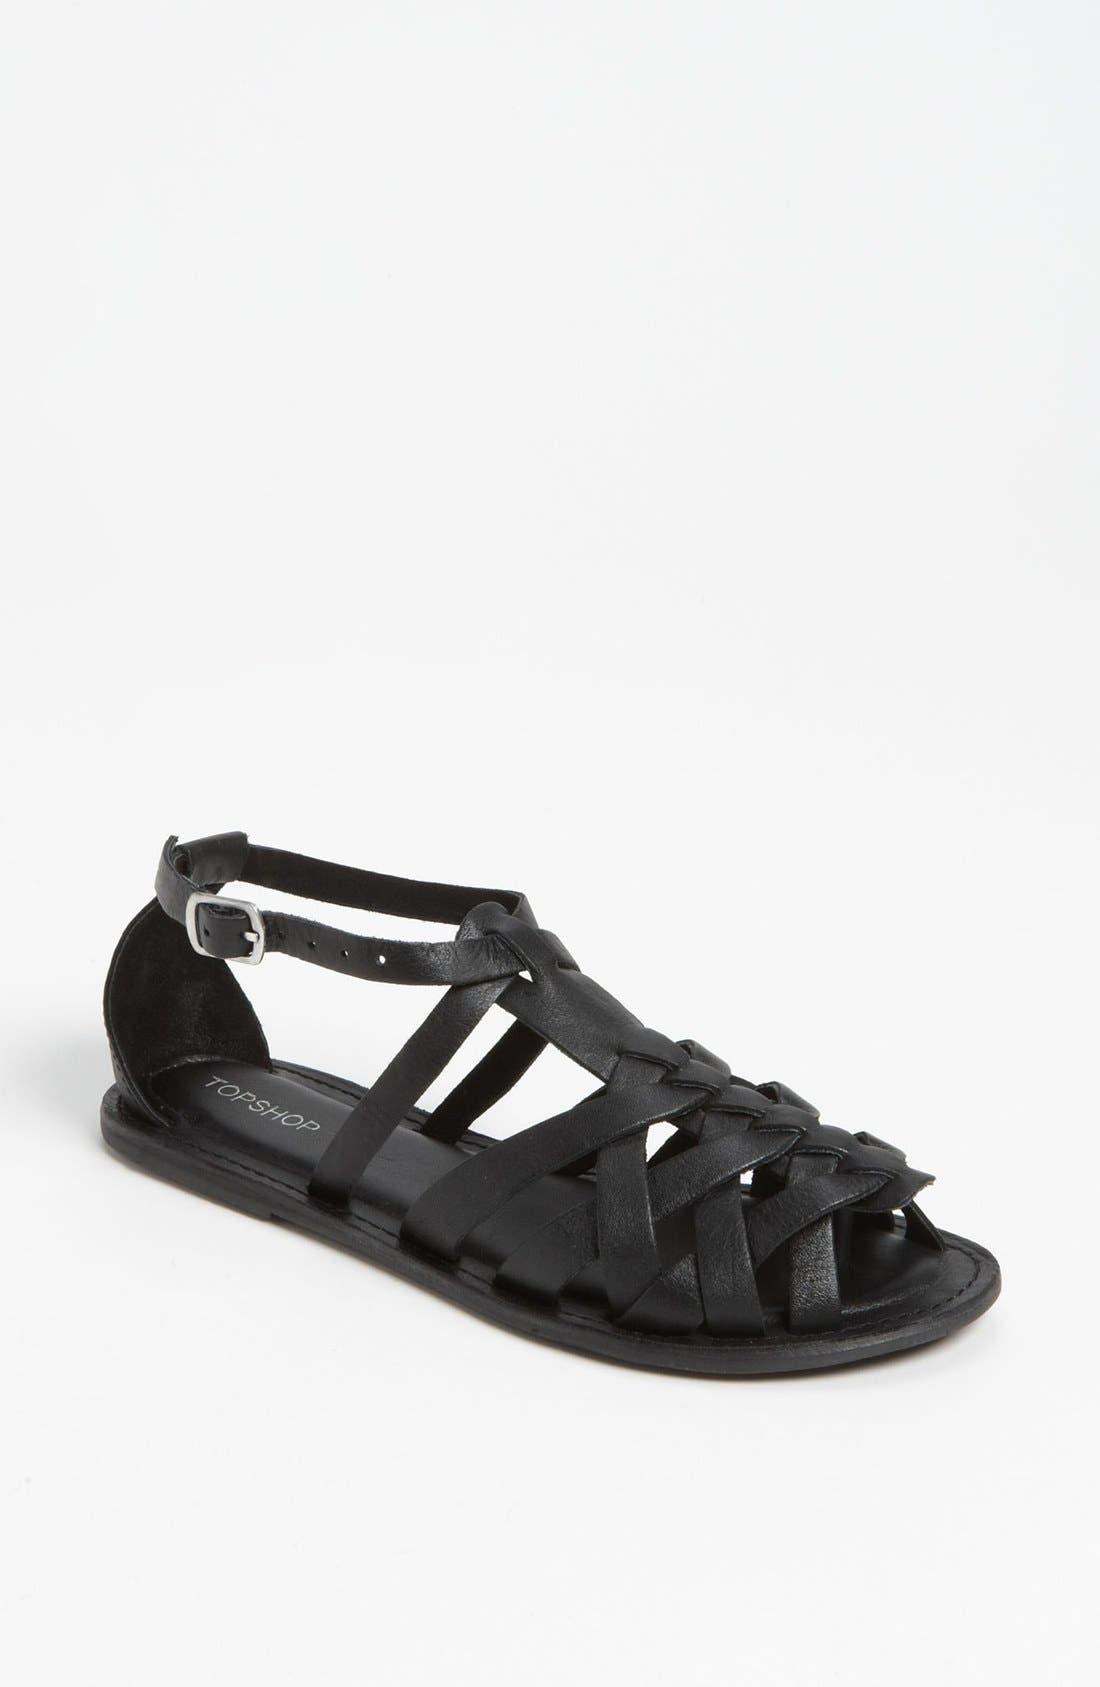 Main Image - Topshop 'Hippy' Sandal